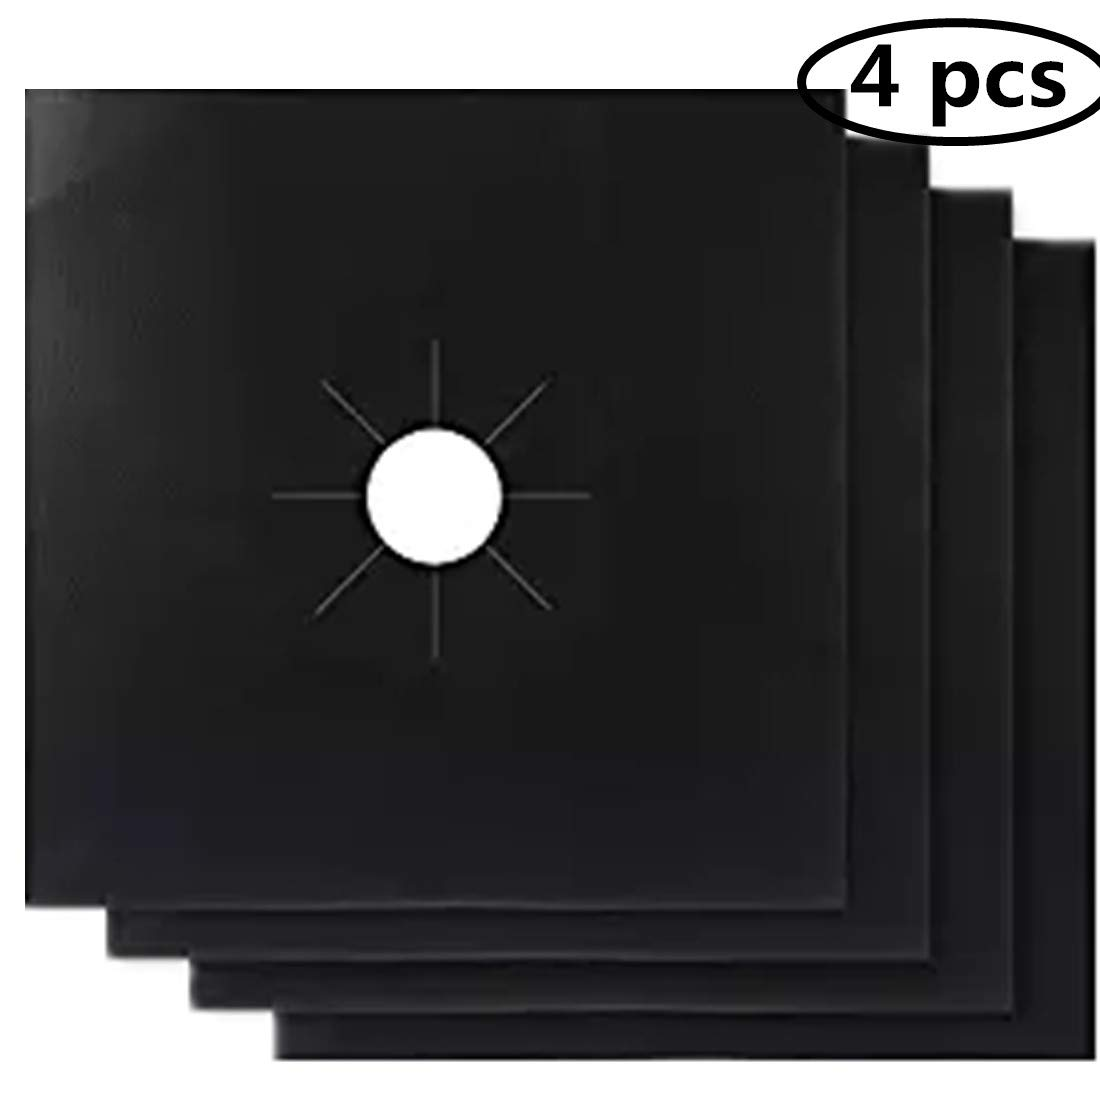 1pc SUNON DC Cooling Fan 40x40x20mm 4020 12V 3pin 0.6W 0.8W 1.38W 2.4W Optional